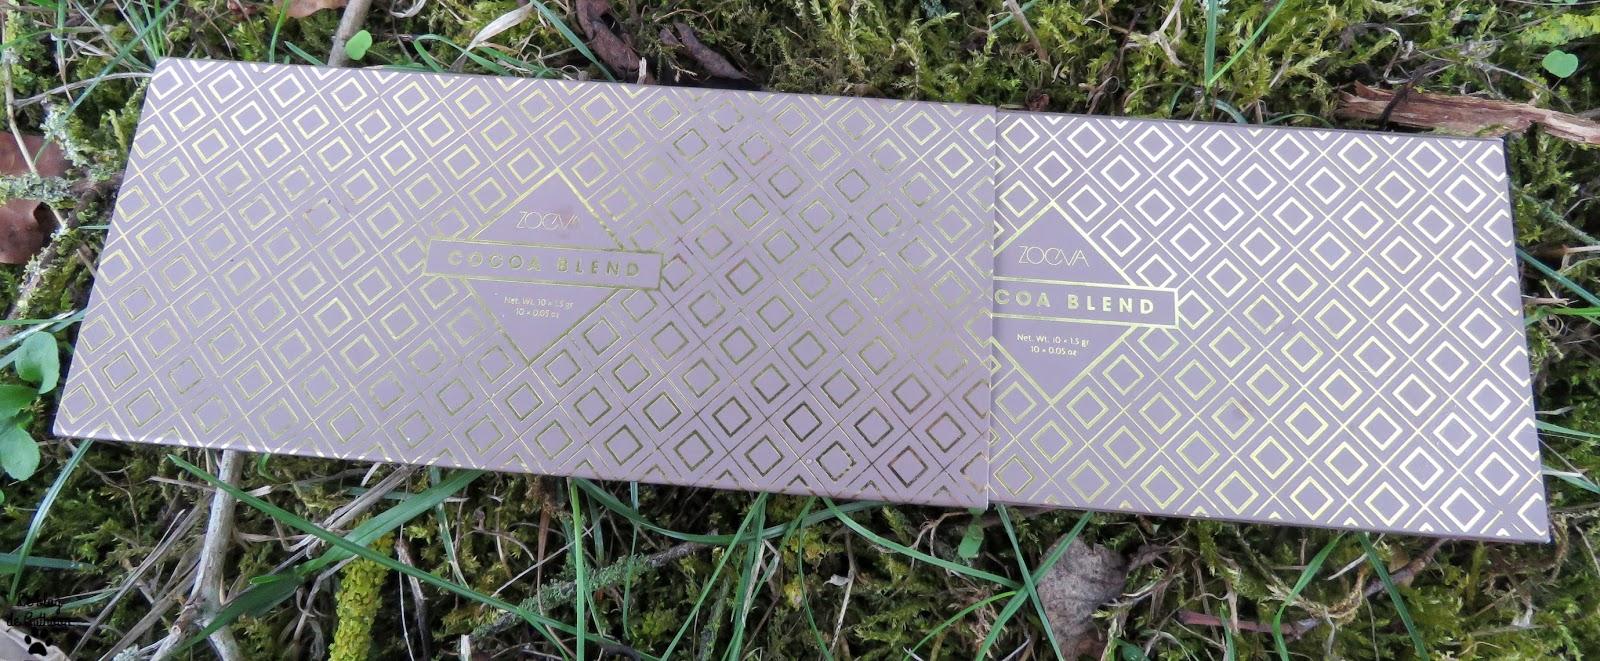 Palette Cocoa Blend de Zoeva